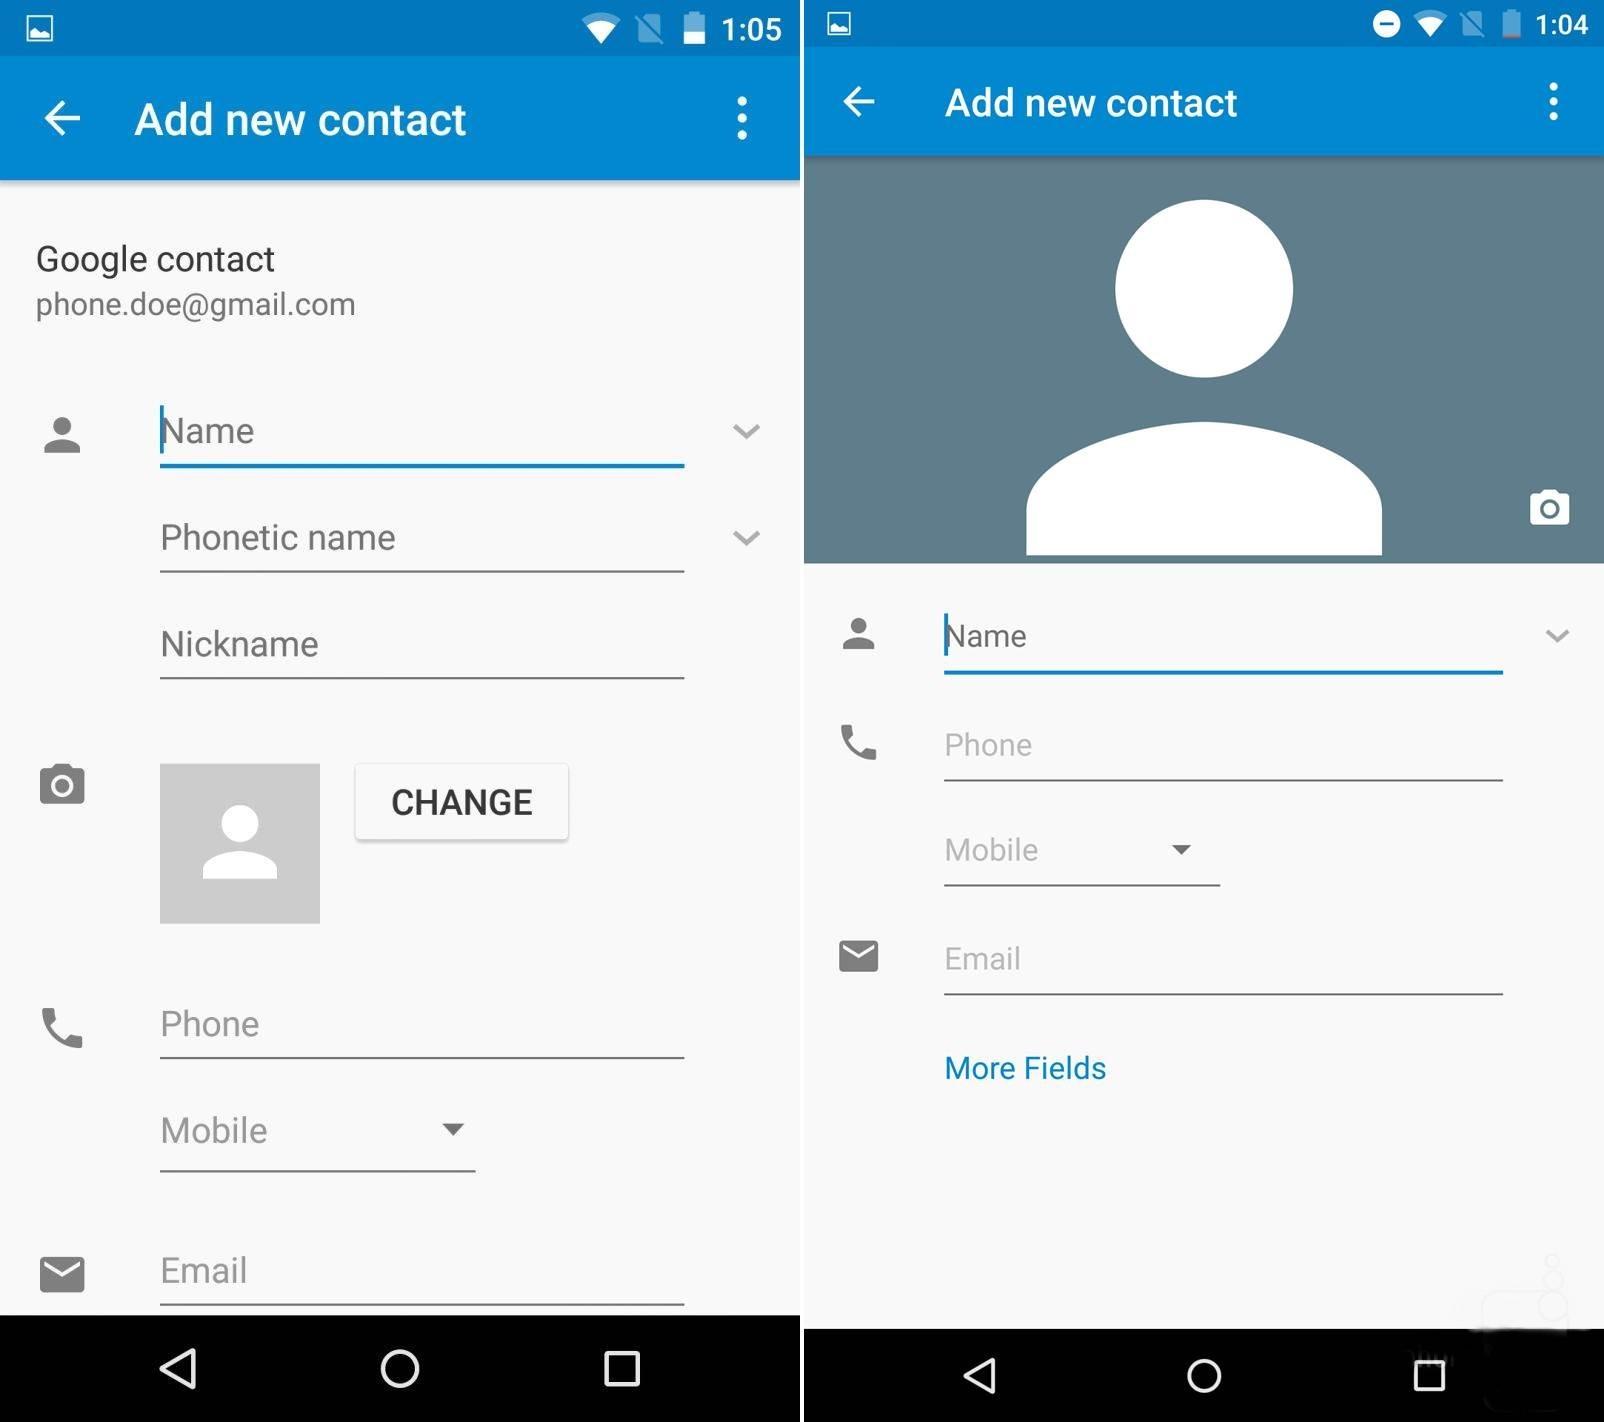 Как поставить фото на контакт Android: установка фото на звонок 96